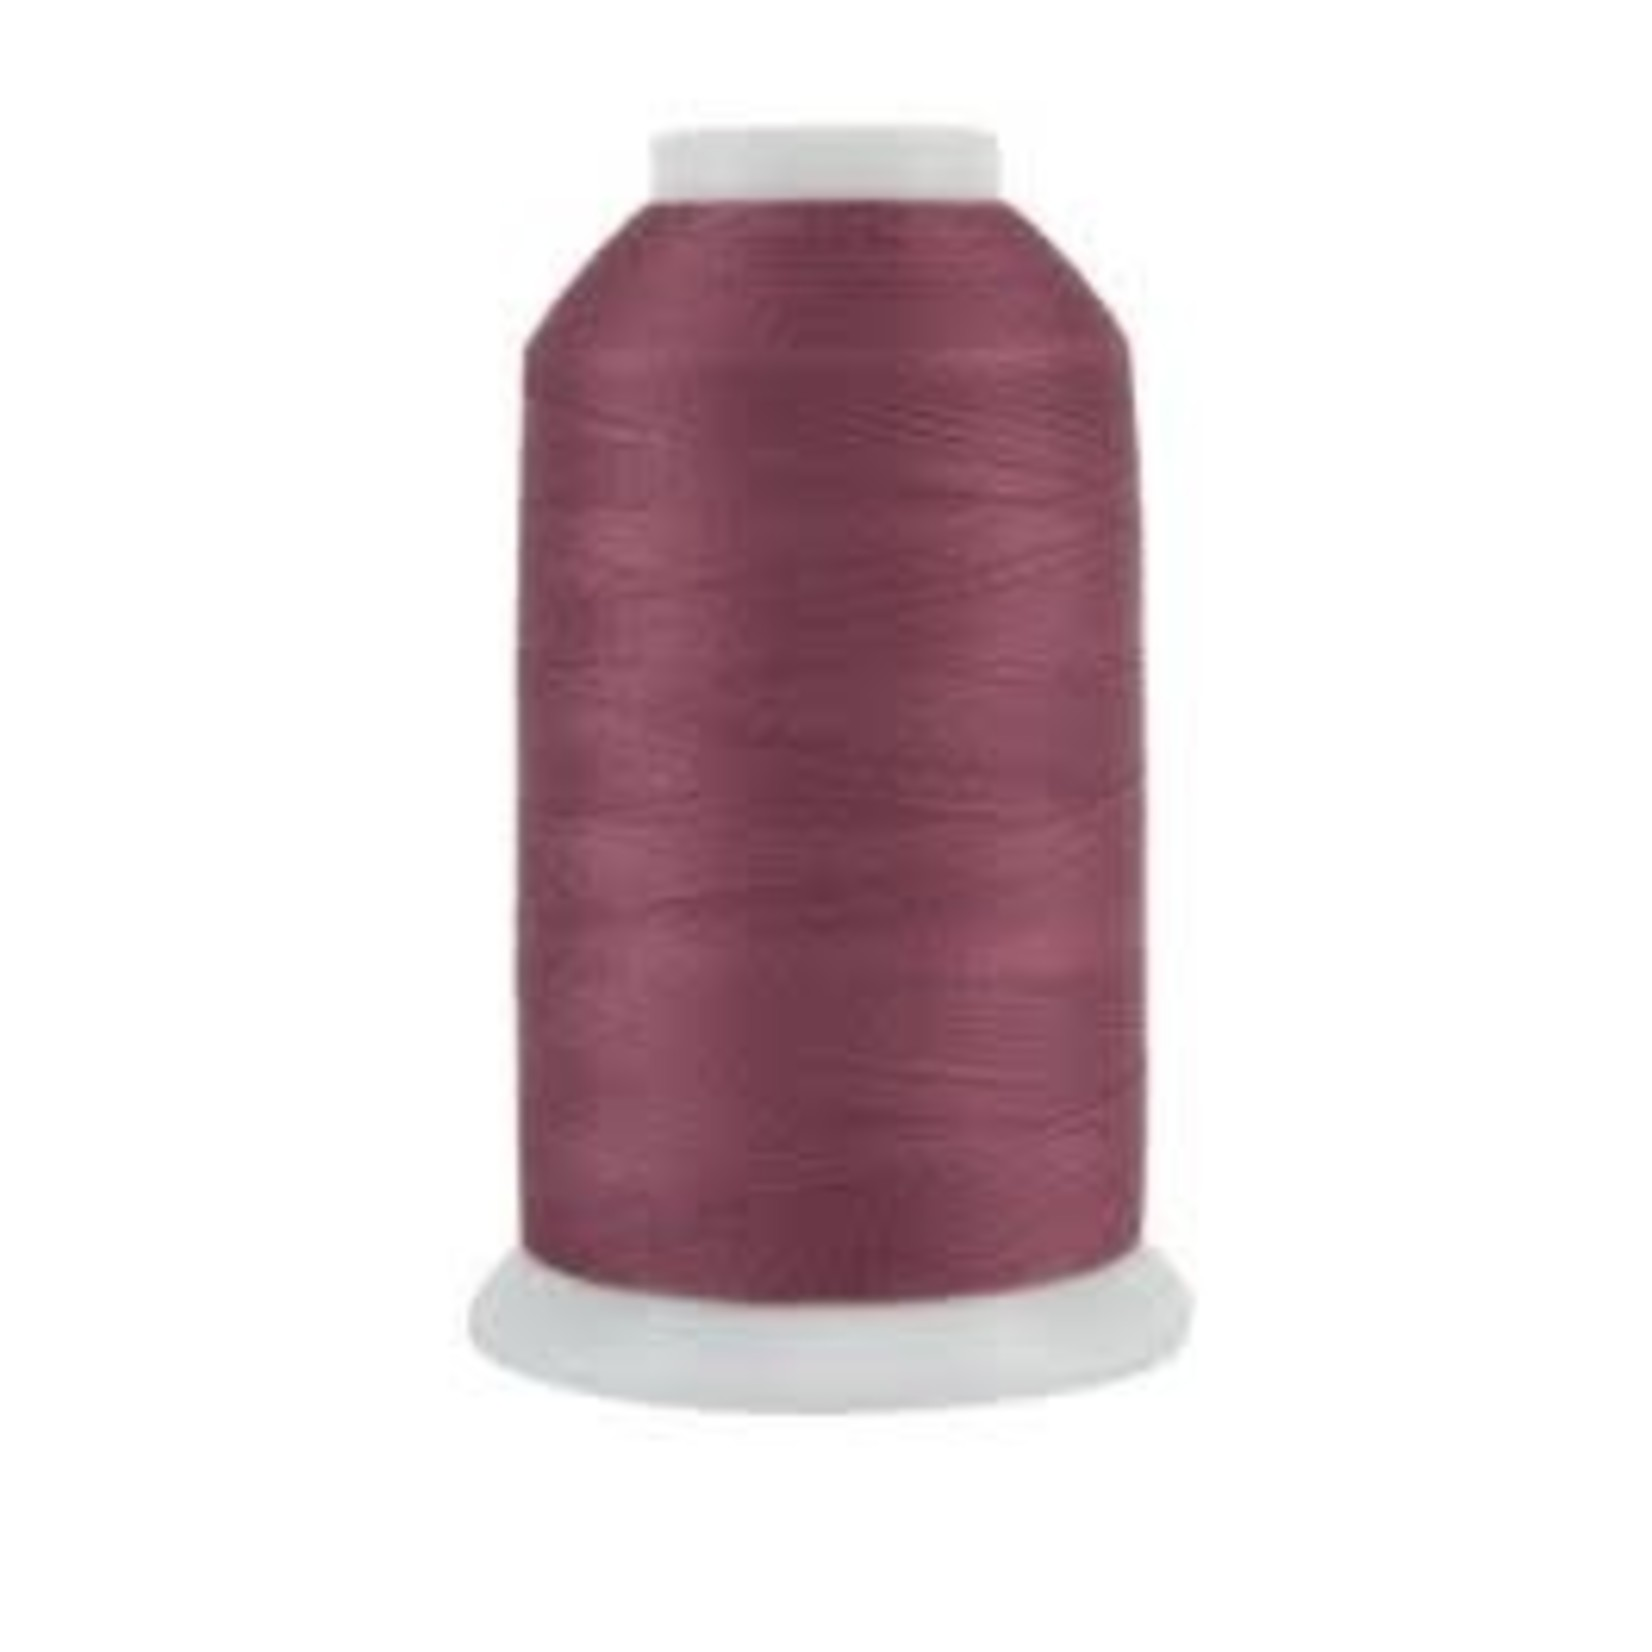 Superior Threads King Tut - #40 - 1828 m - 1020 Raspberry Ripple